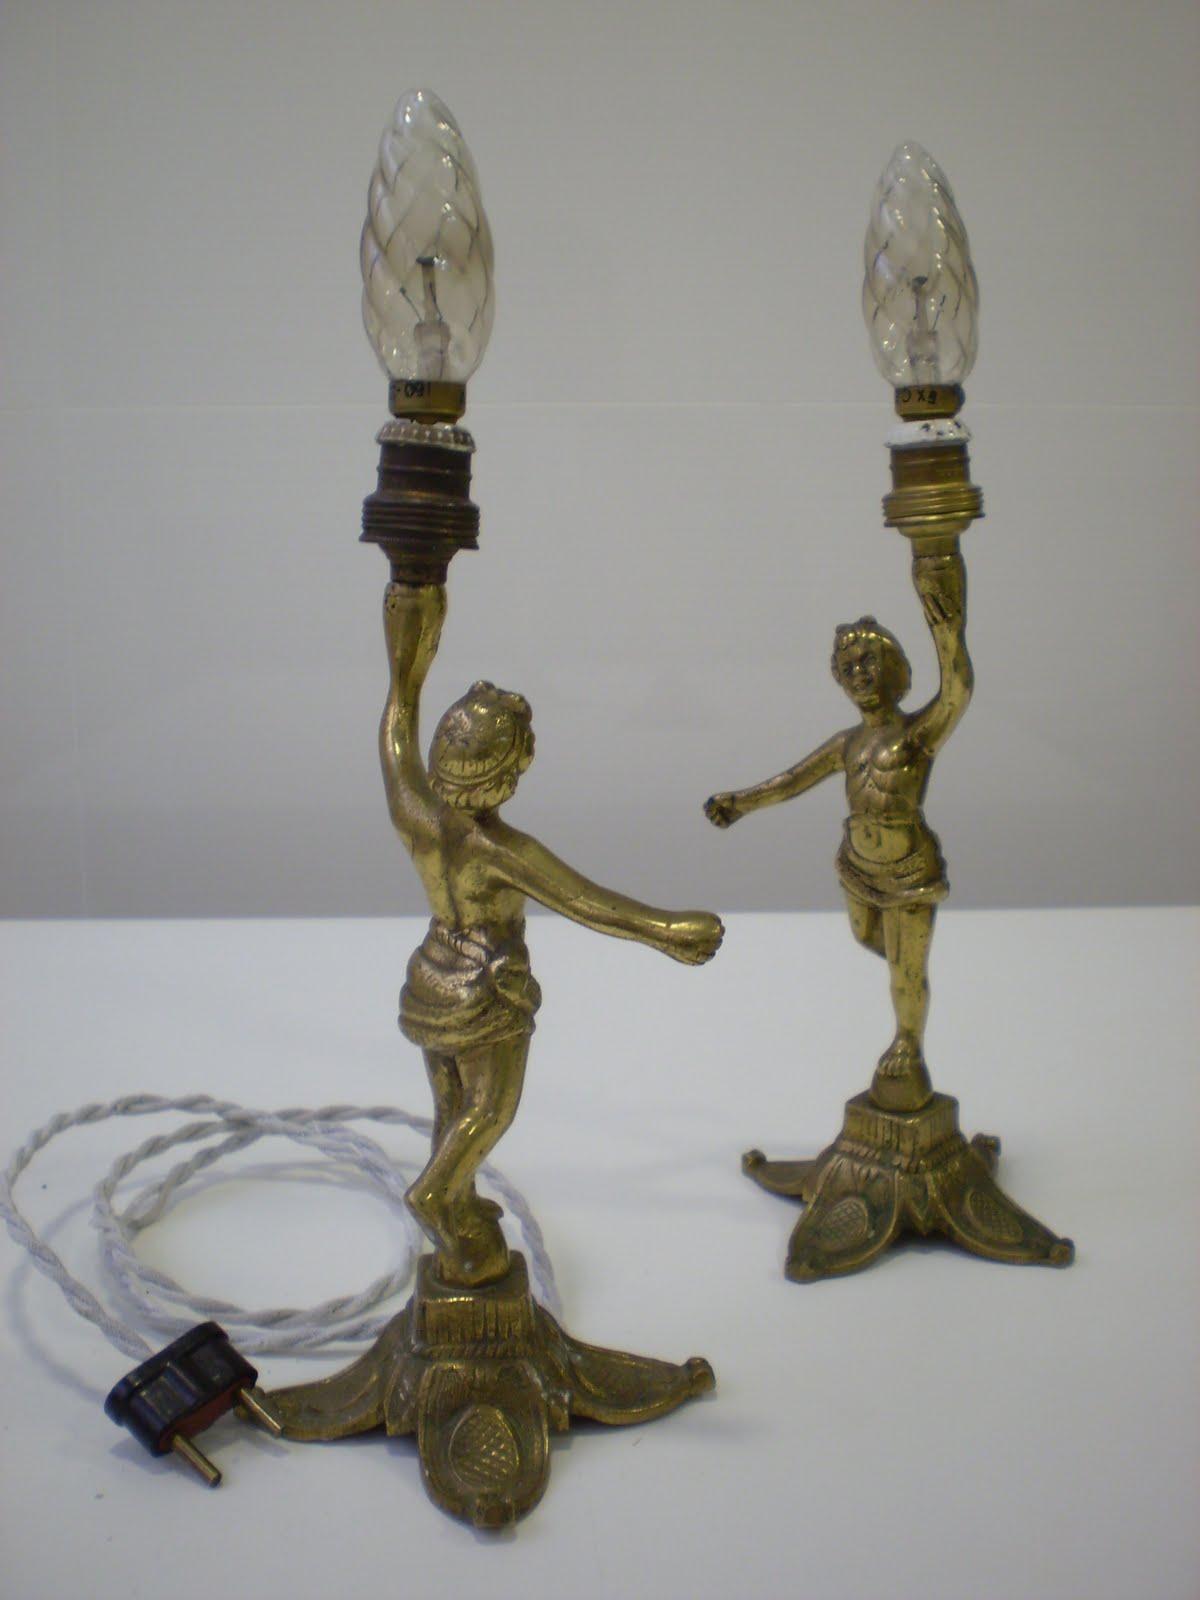 Vintager a pareja de l mparas modernistas de figura de - Lamparas anos 20 ...